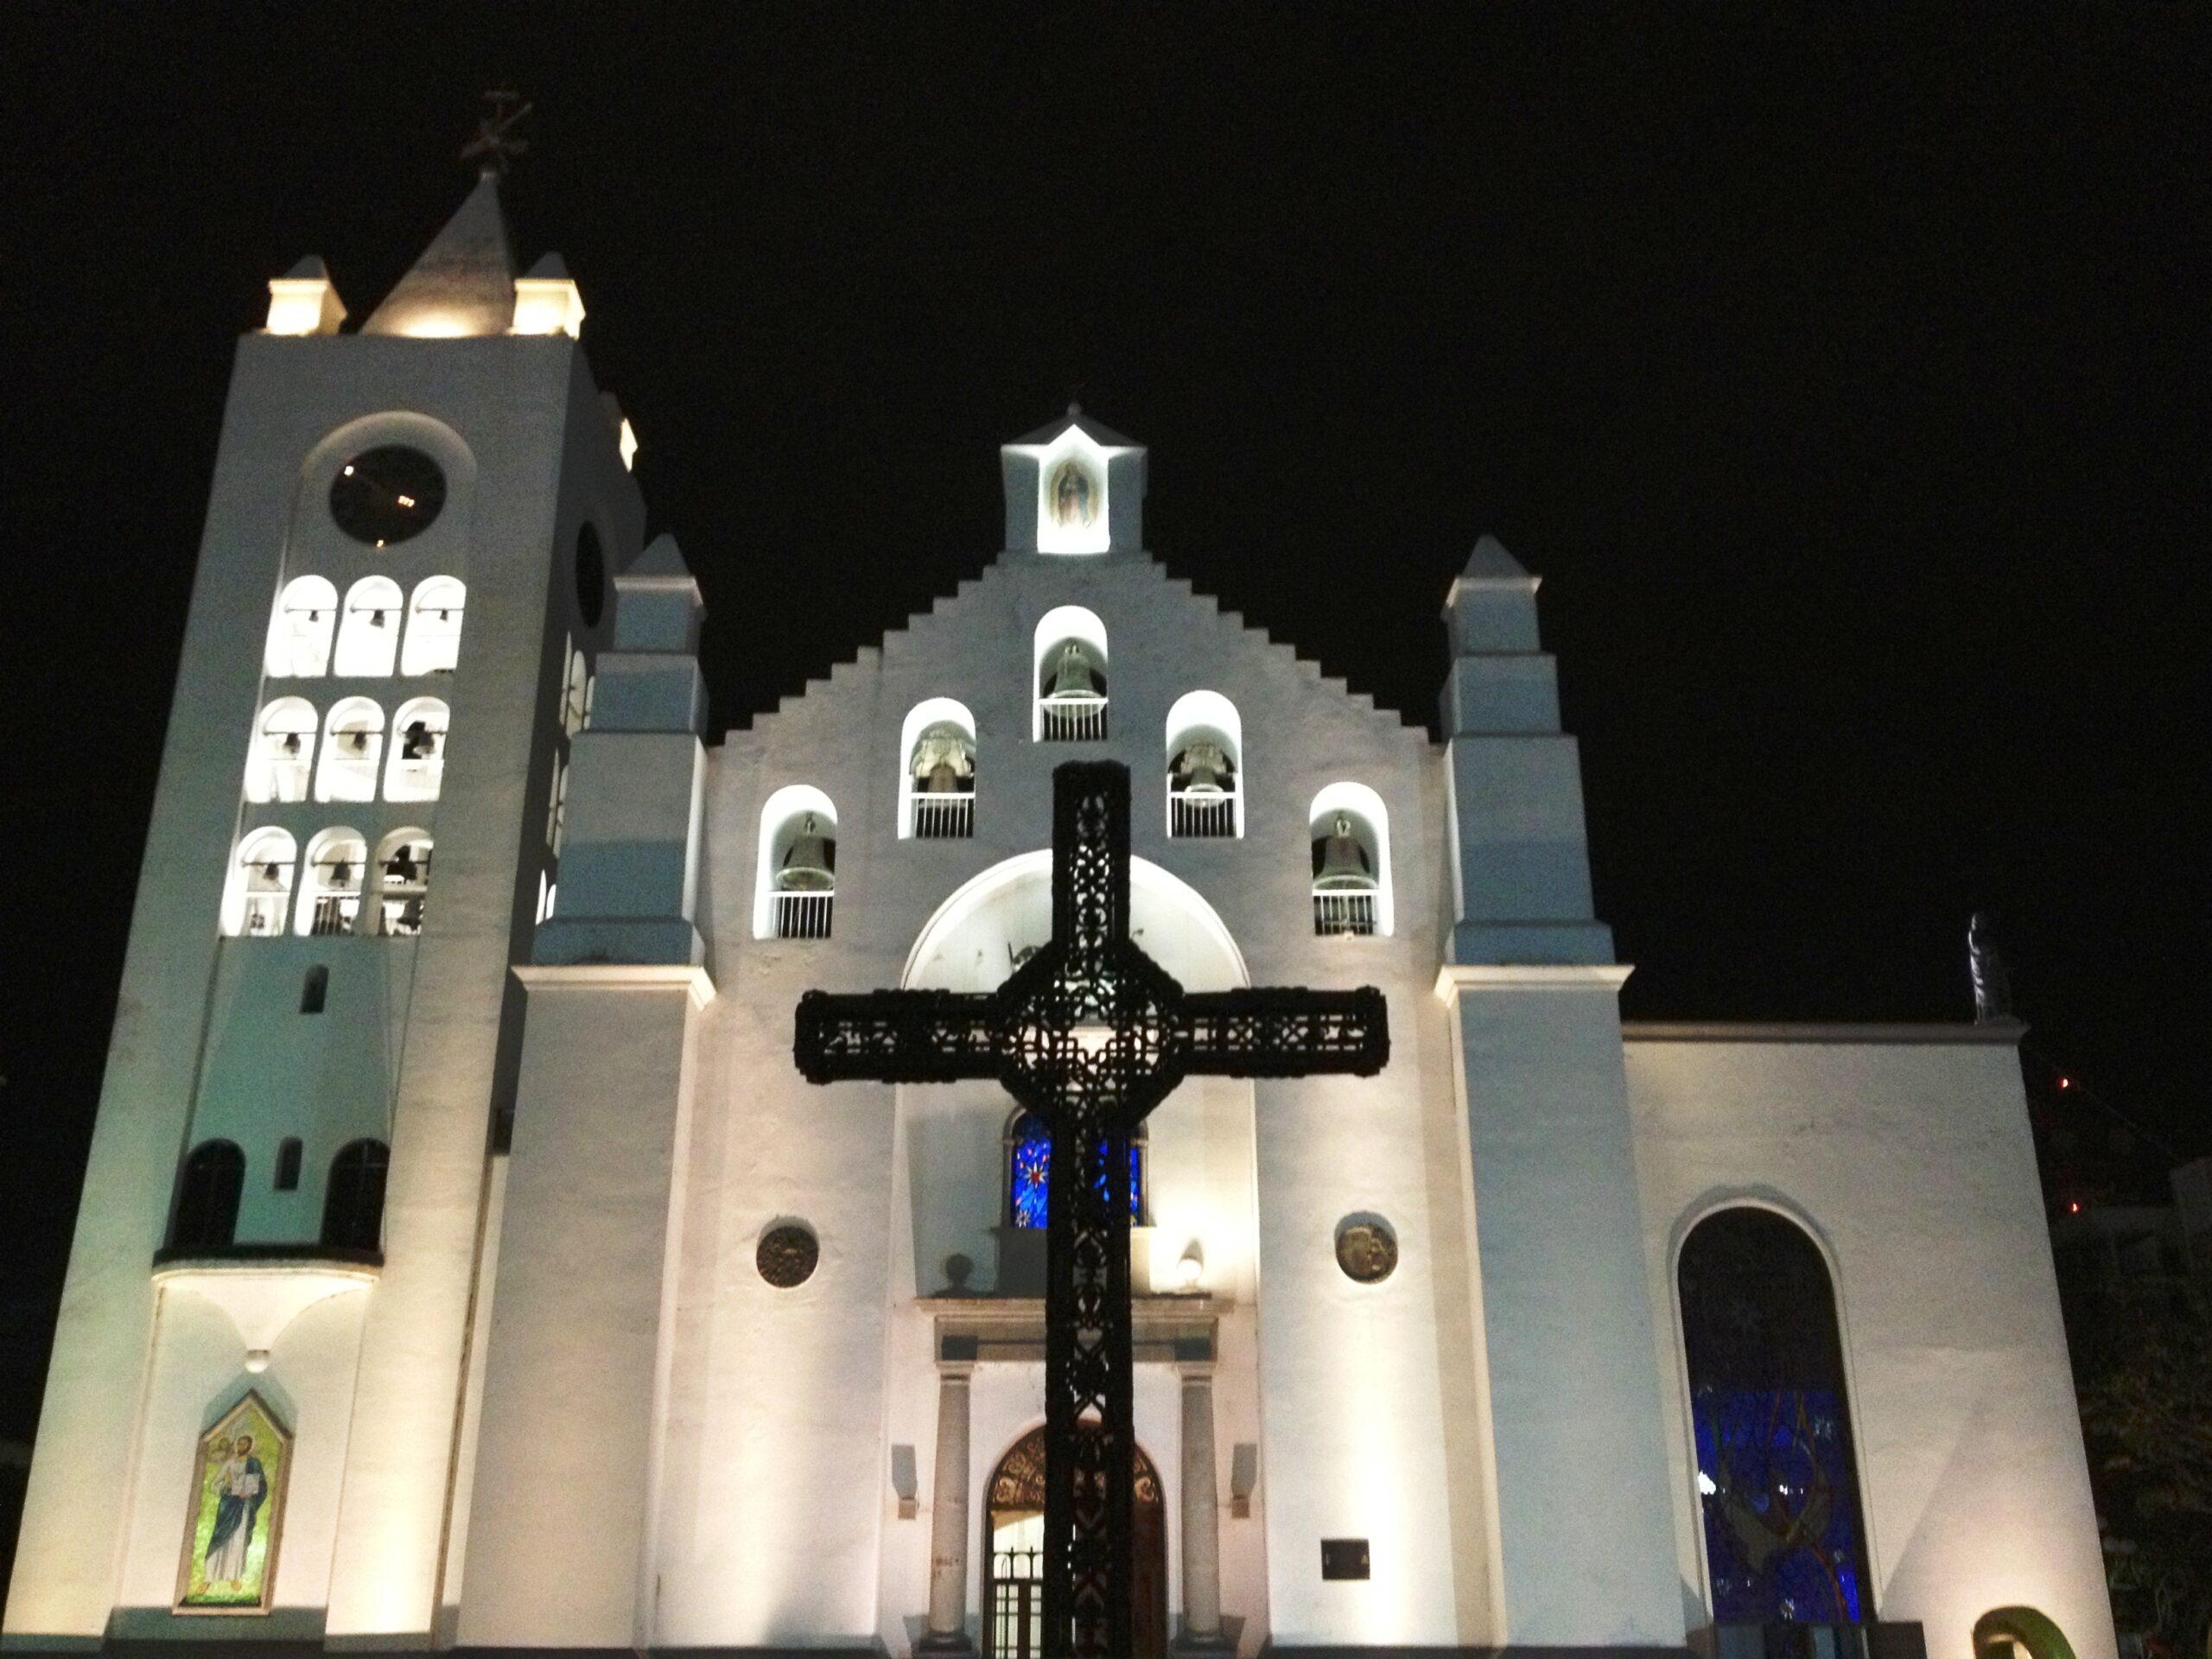 Horario de Misas en Misas en Tuxtla Gutiérrez